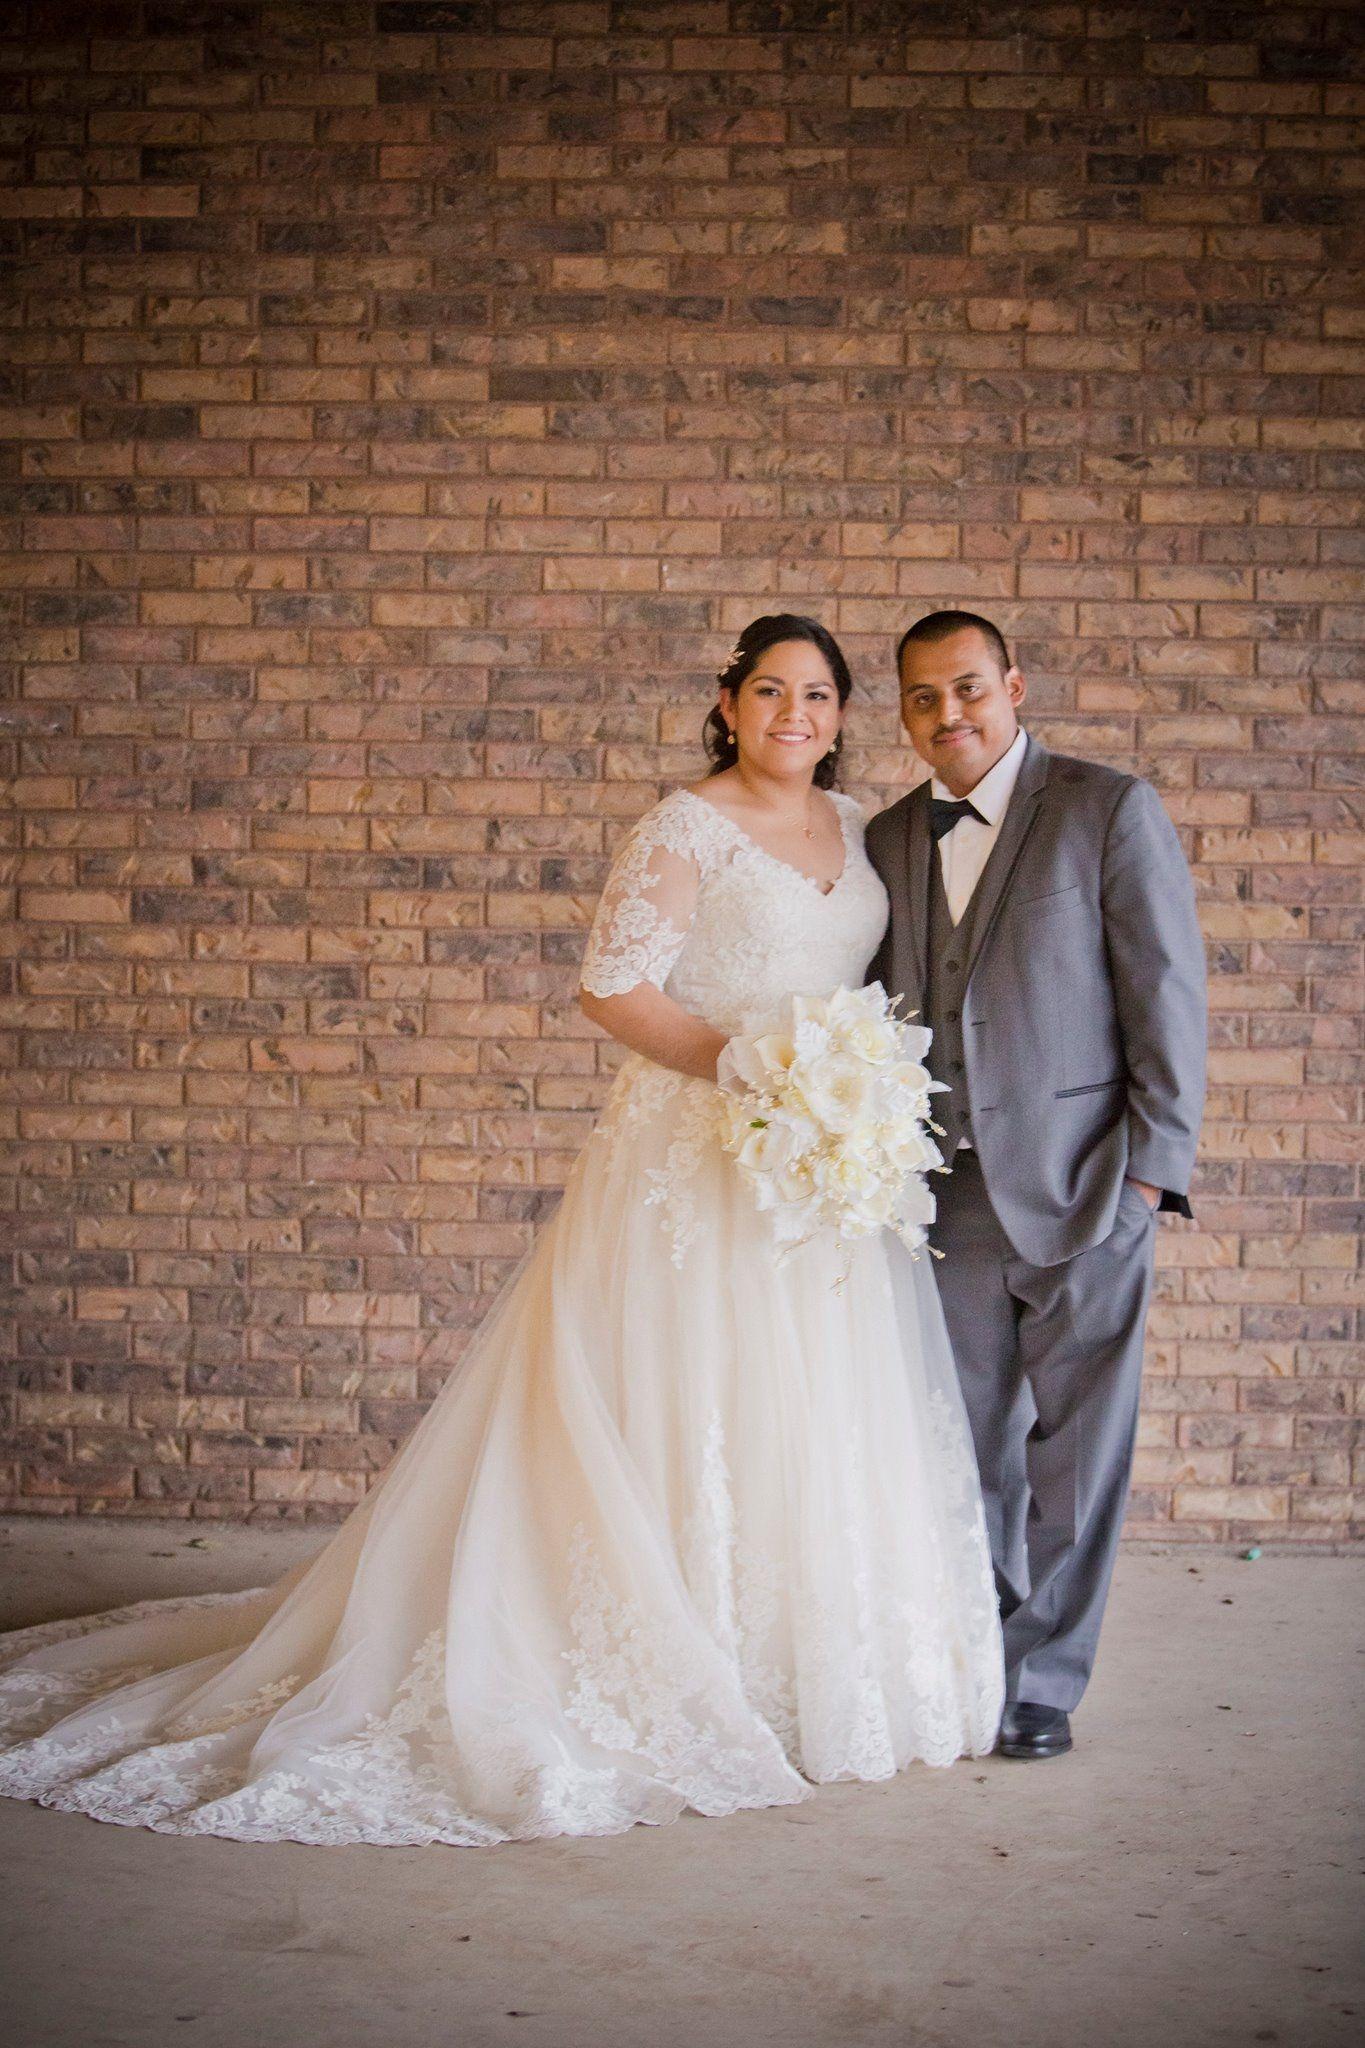 Ballgown Wedding Dress From Fantasy Bridal Ballgown Half Sleeve V Neck Curvy Bride Utahbride Utah Wedding Dress Store Wedding Dresses Modest Bridal Gowns [ 2048 x 1365 Pixel ]